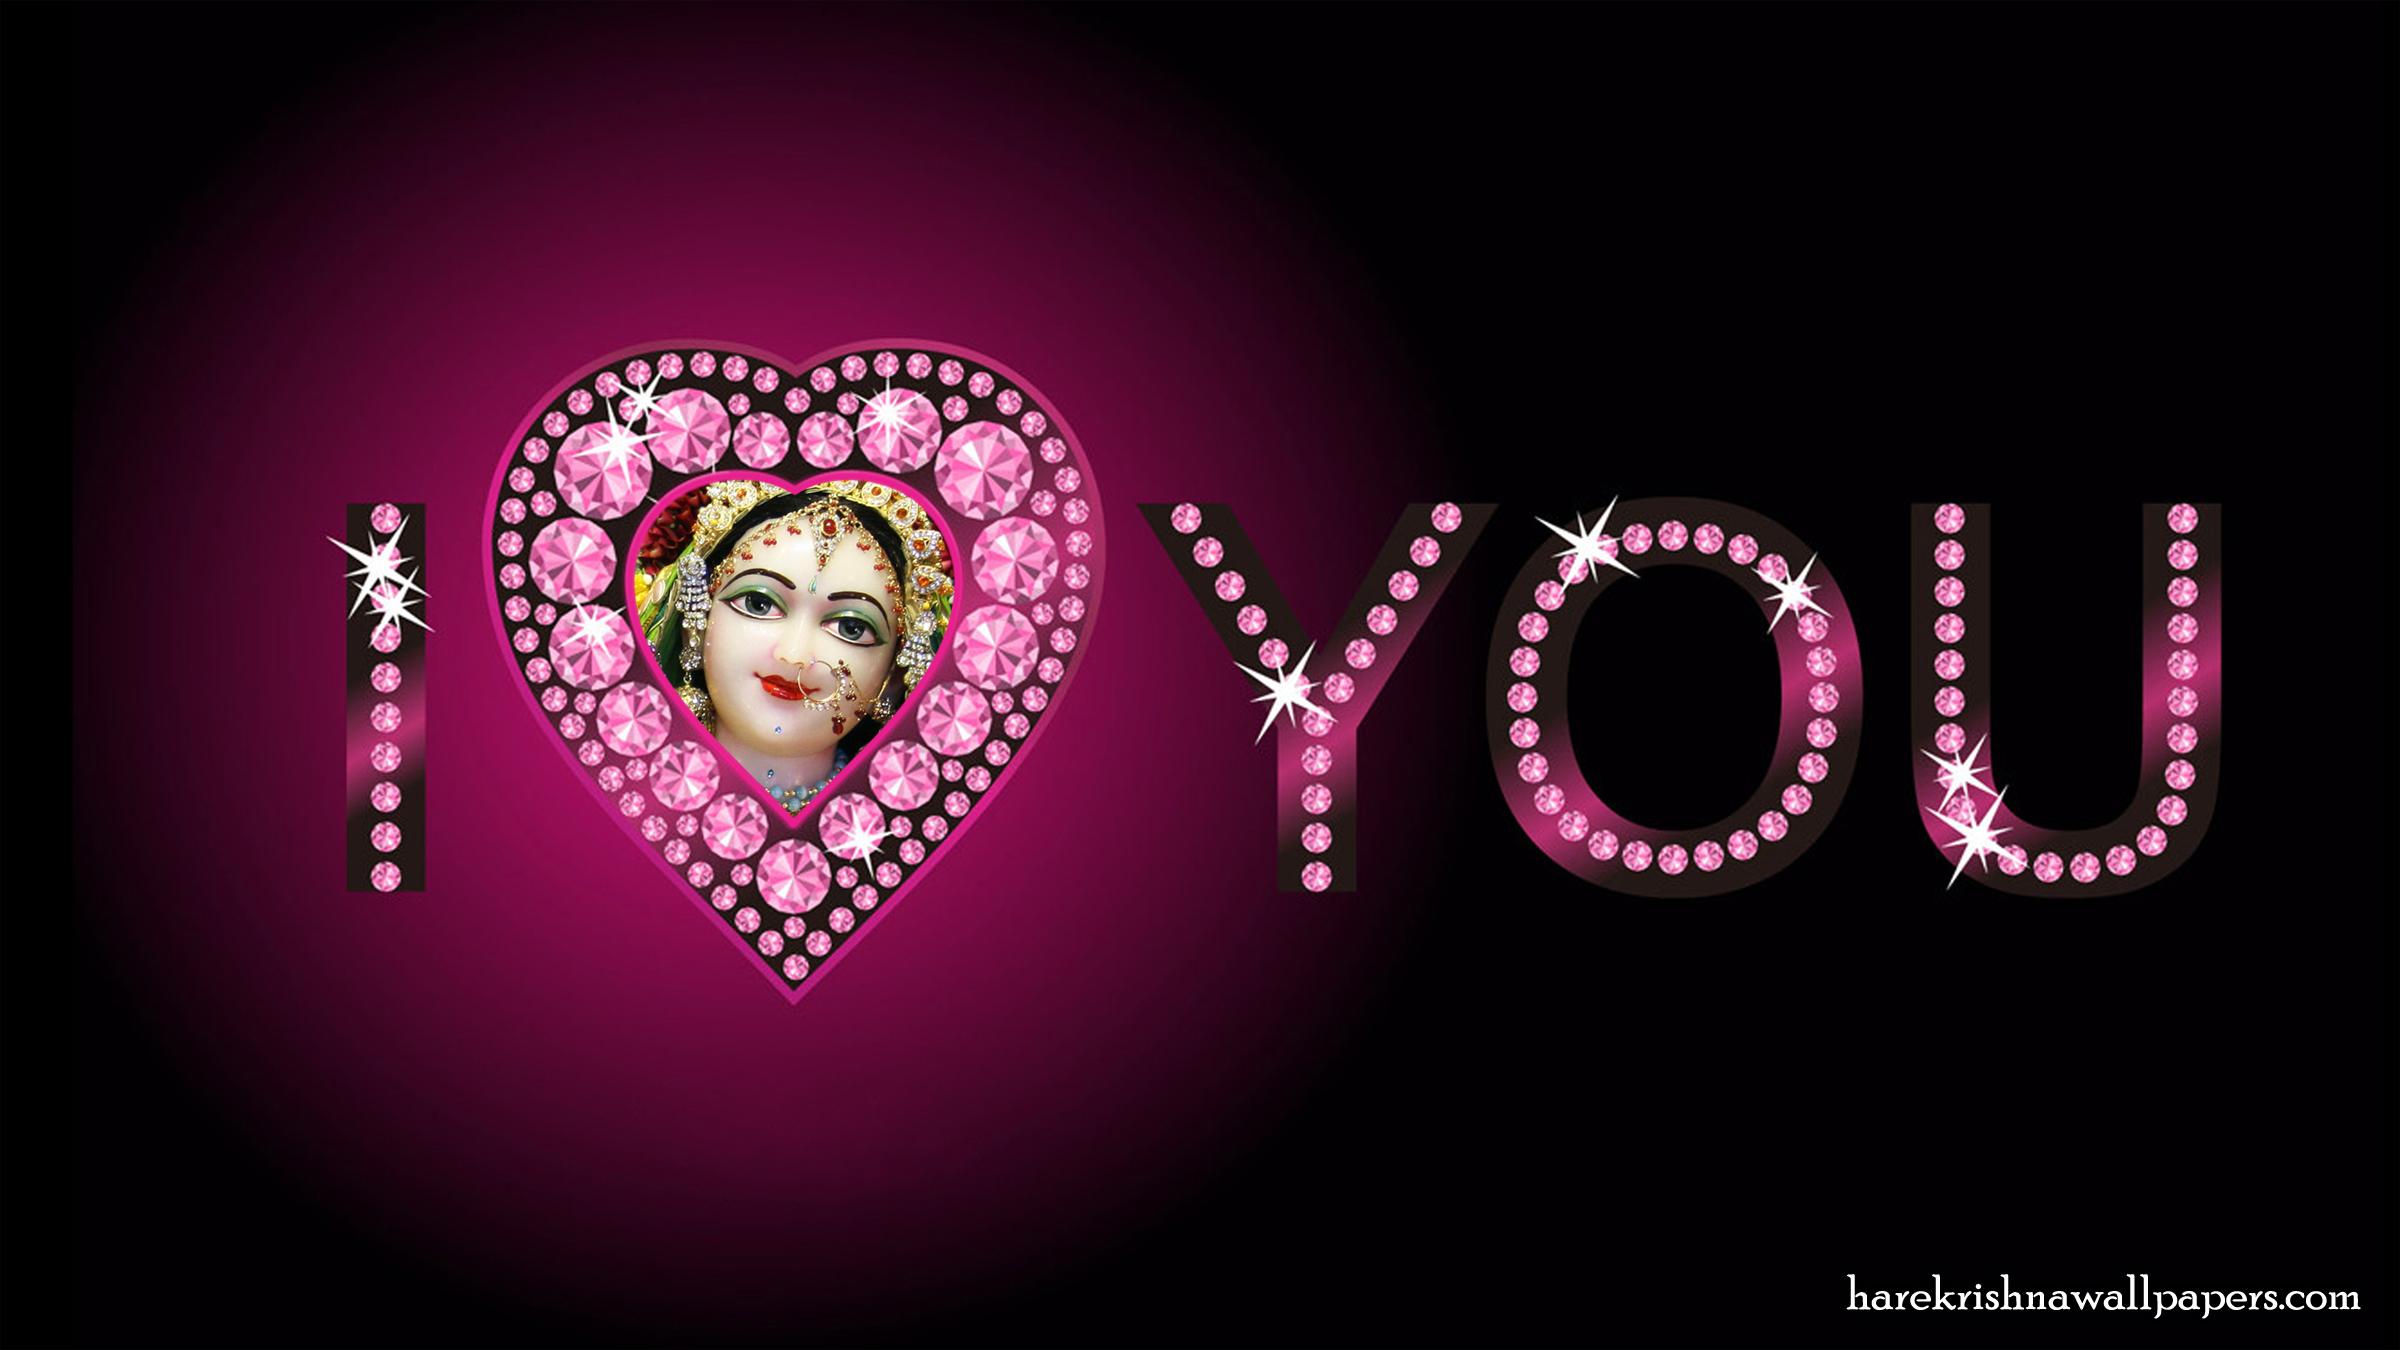 I Love You Radharani Wallpaper (015) Size 2400x1350 Download